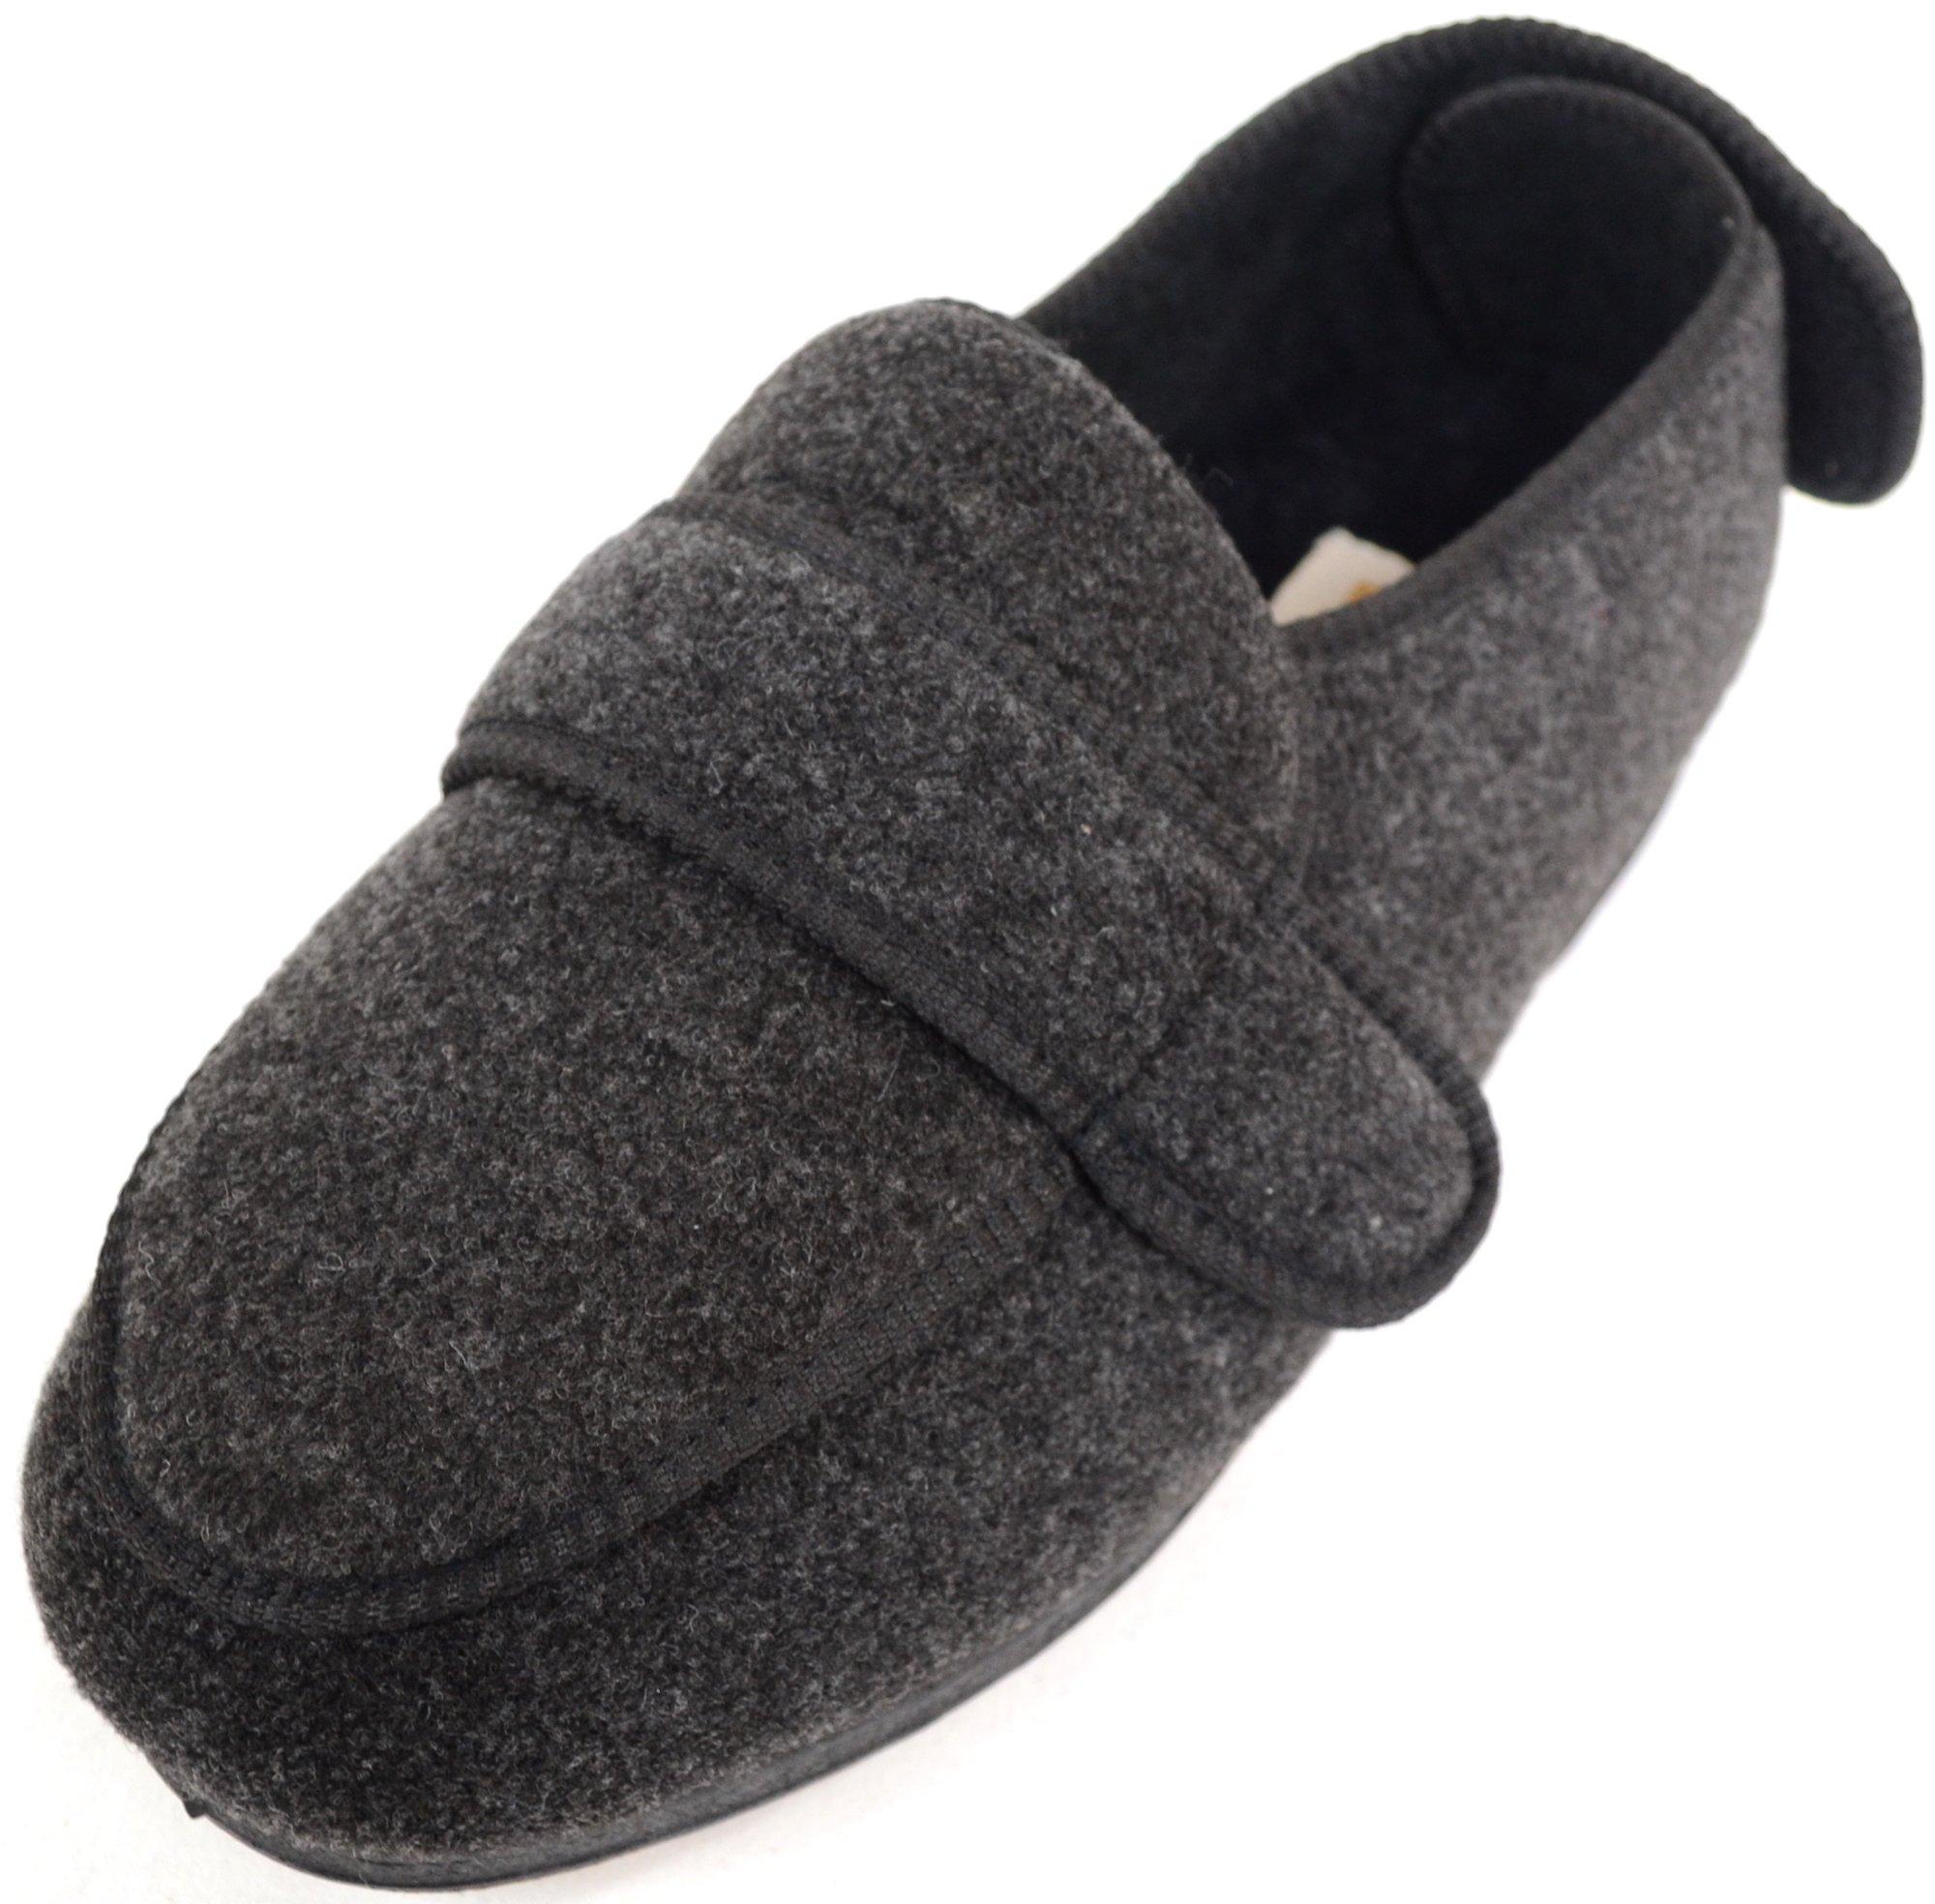 ABSOLUTE FOOTWEAR Mens Orthopaedic/Extra Wide Fit Adjustable Slipper Boot/Slippers - Grey - 10 US by ABSOLUTE FOOTWEAR (Image #1)